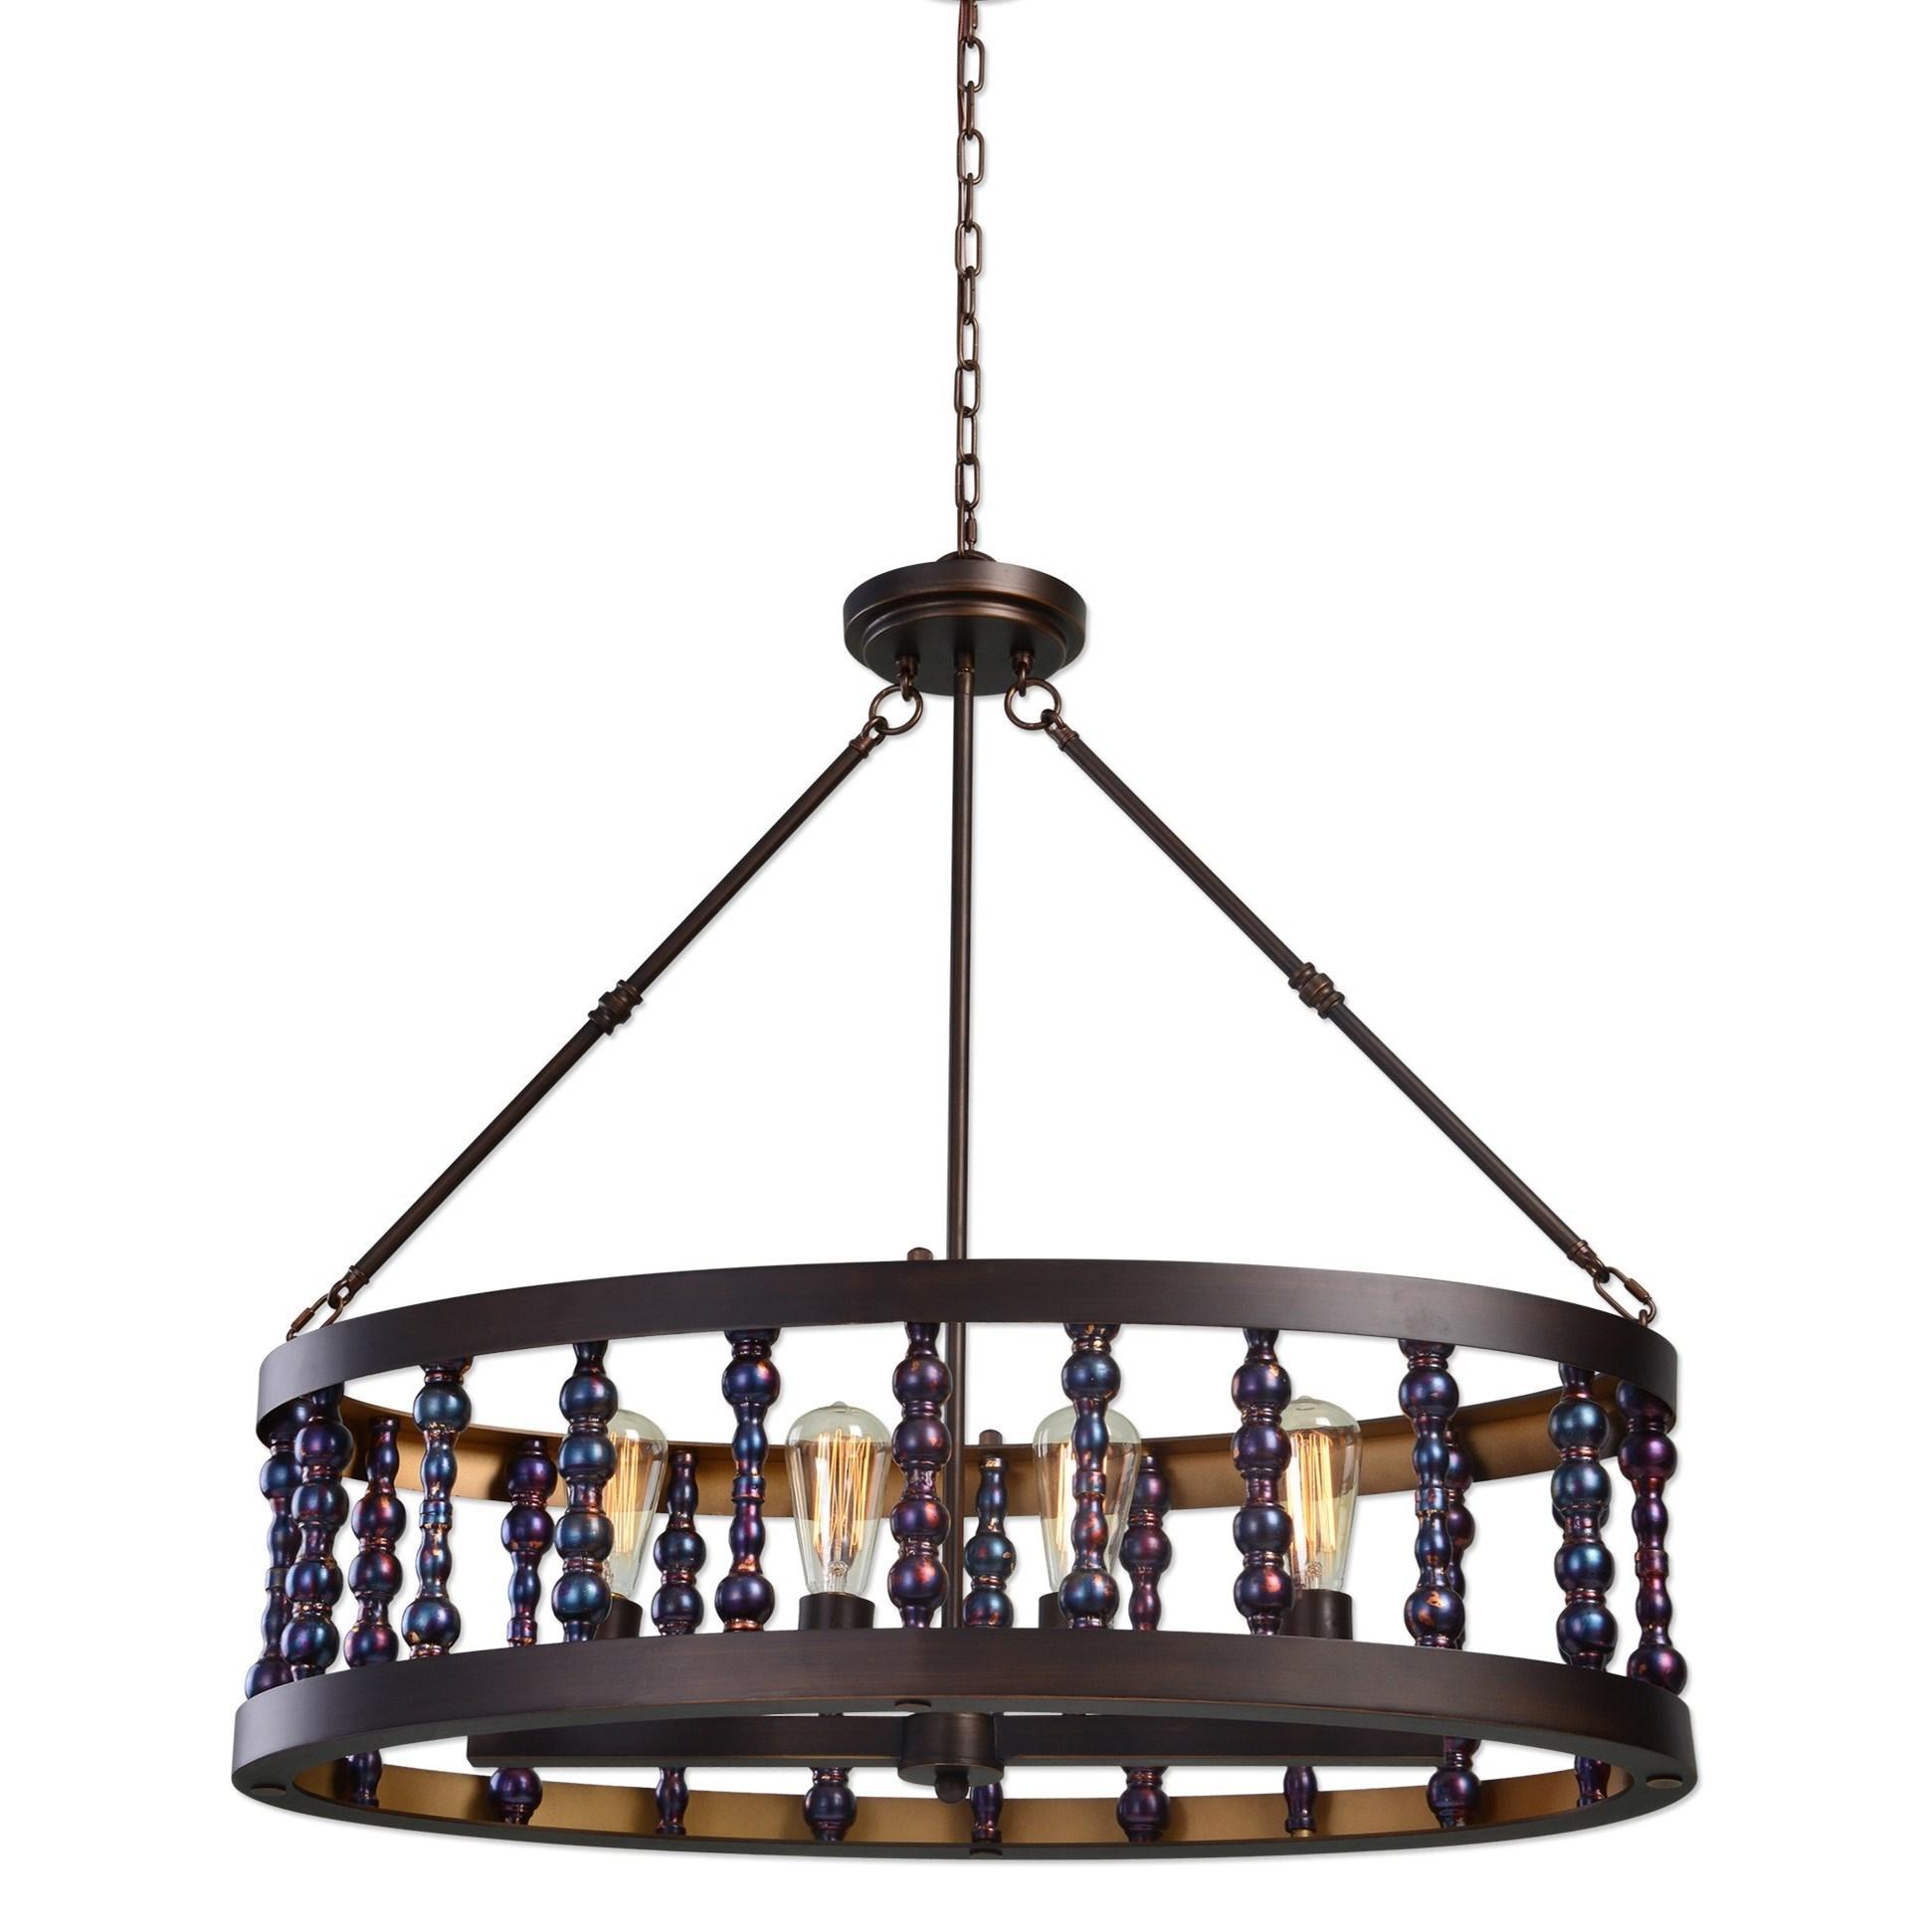 Uttermost Lighting Fixtures Mandrino 4 Light Oval Chandelier - Item Number: 21287